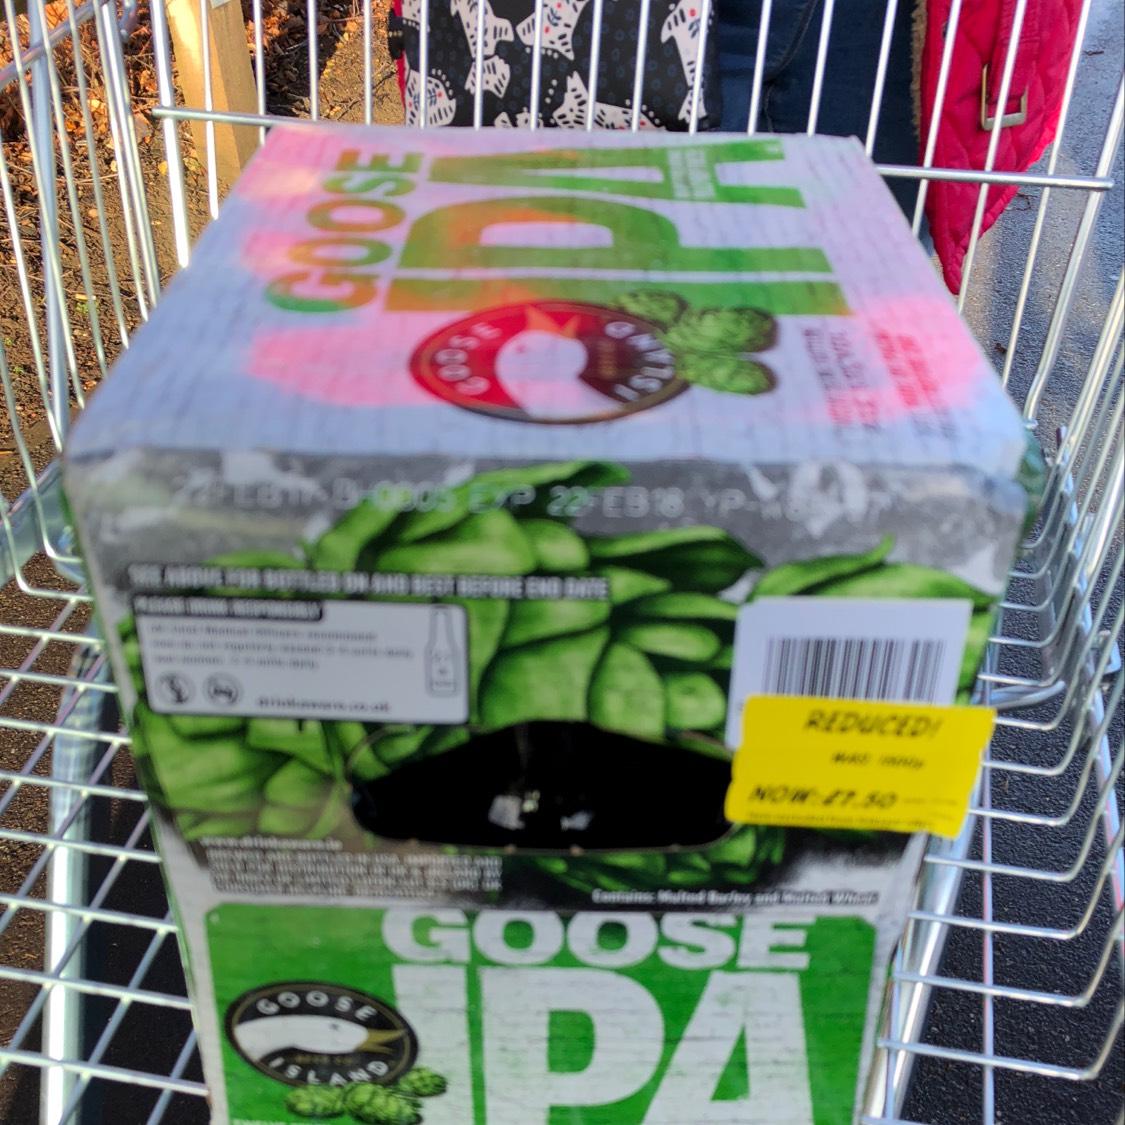 Goose IPA in Asda 12 bottles £7.50 intore - Grantham